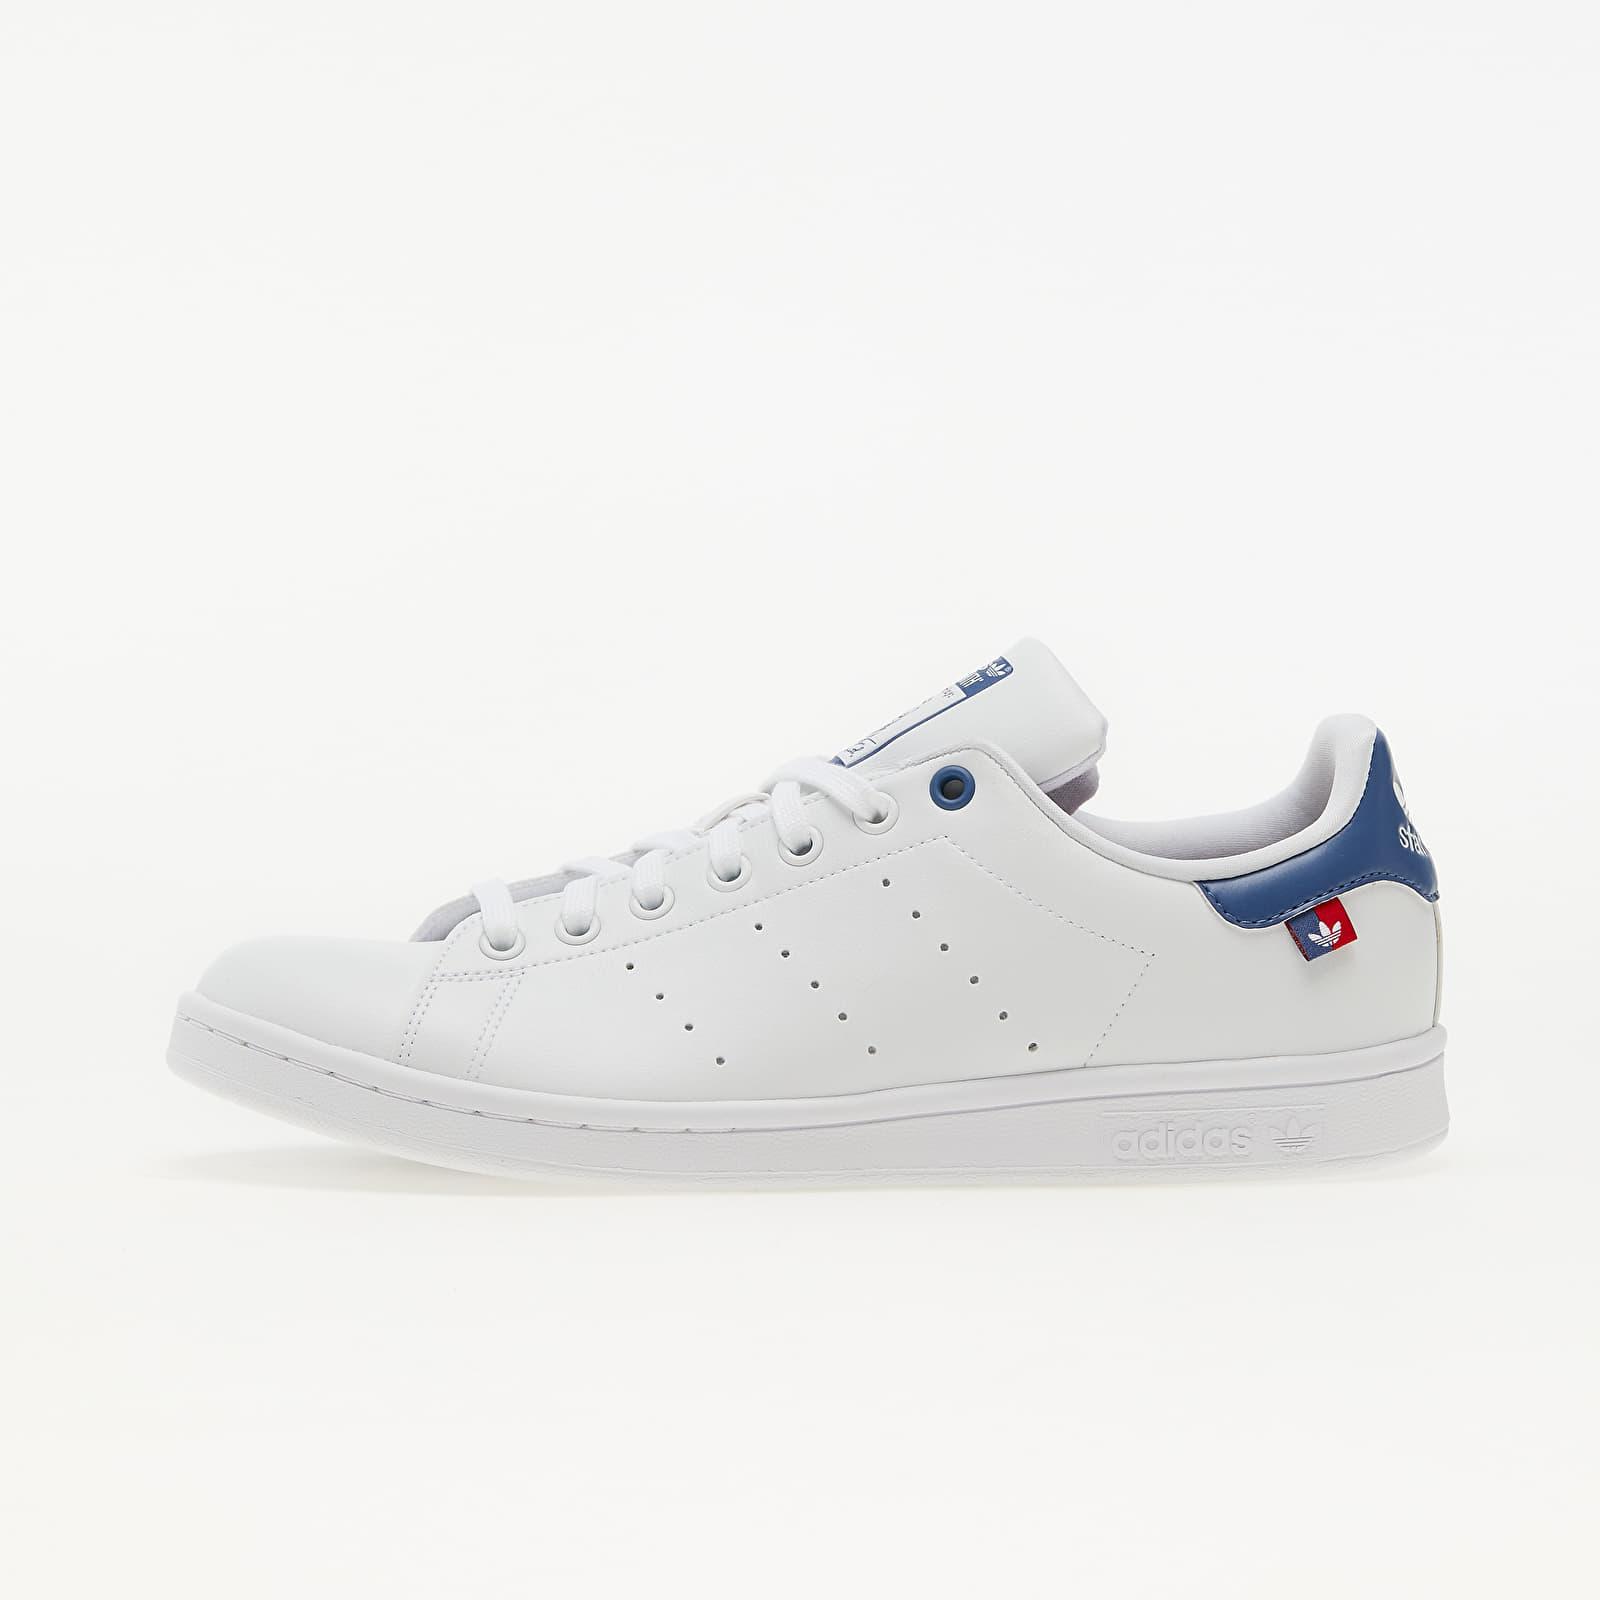 adidas Stan Smith Ftw White/ Scarlet/ Core Blue FX5548